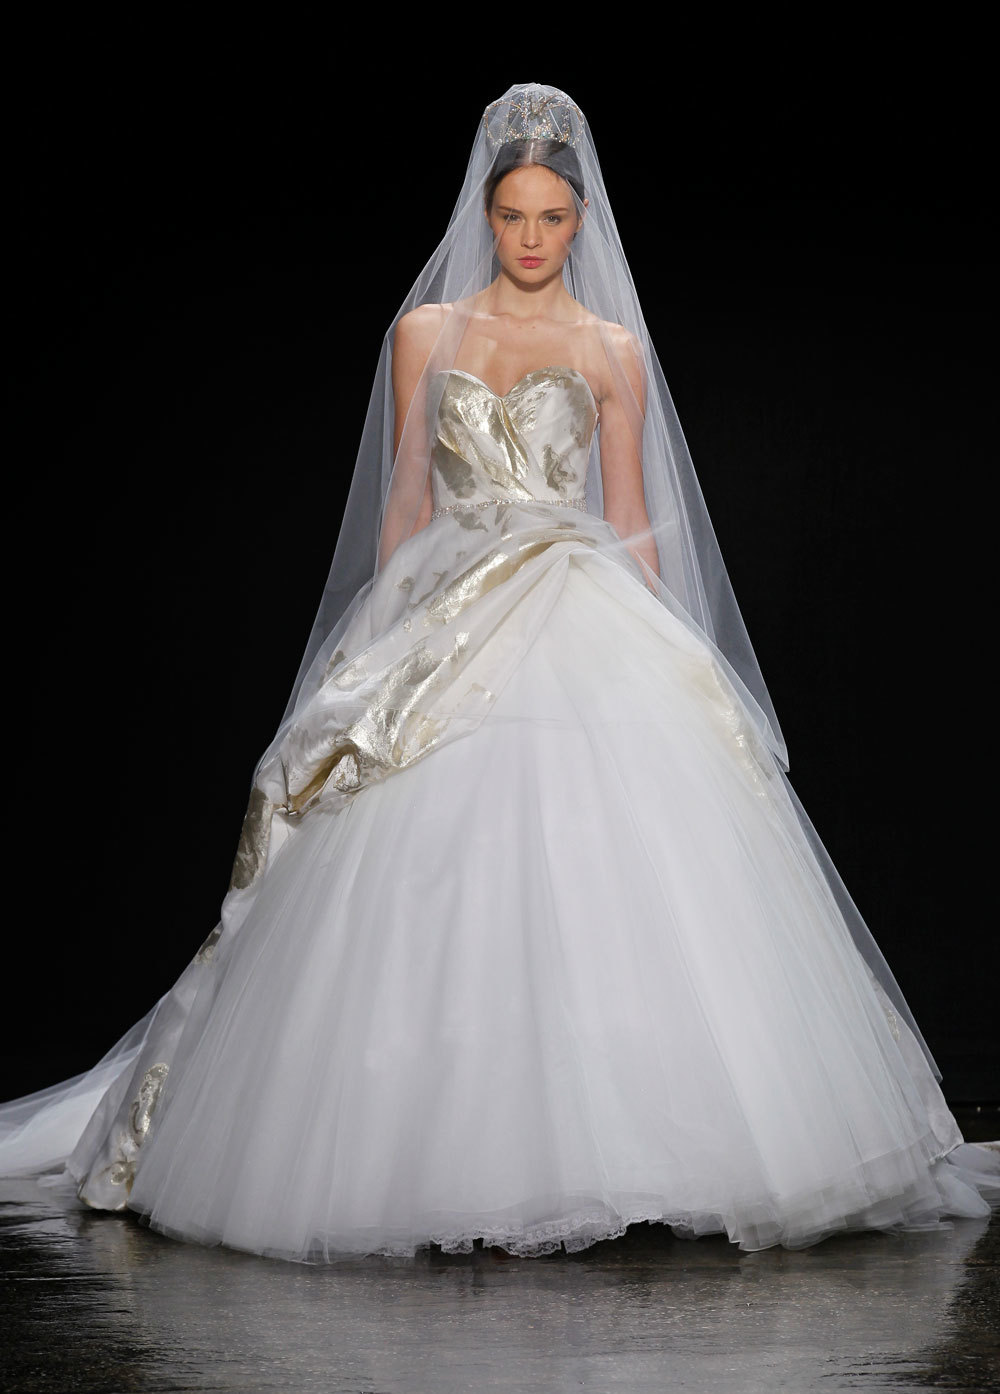 Glamorous Wedding Ball Gown